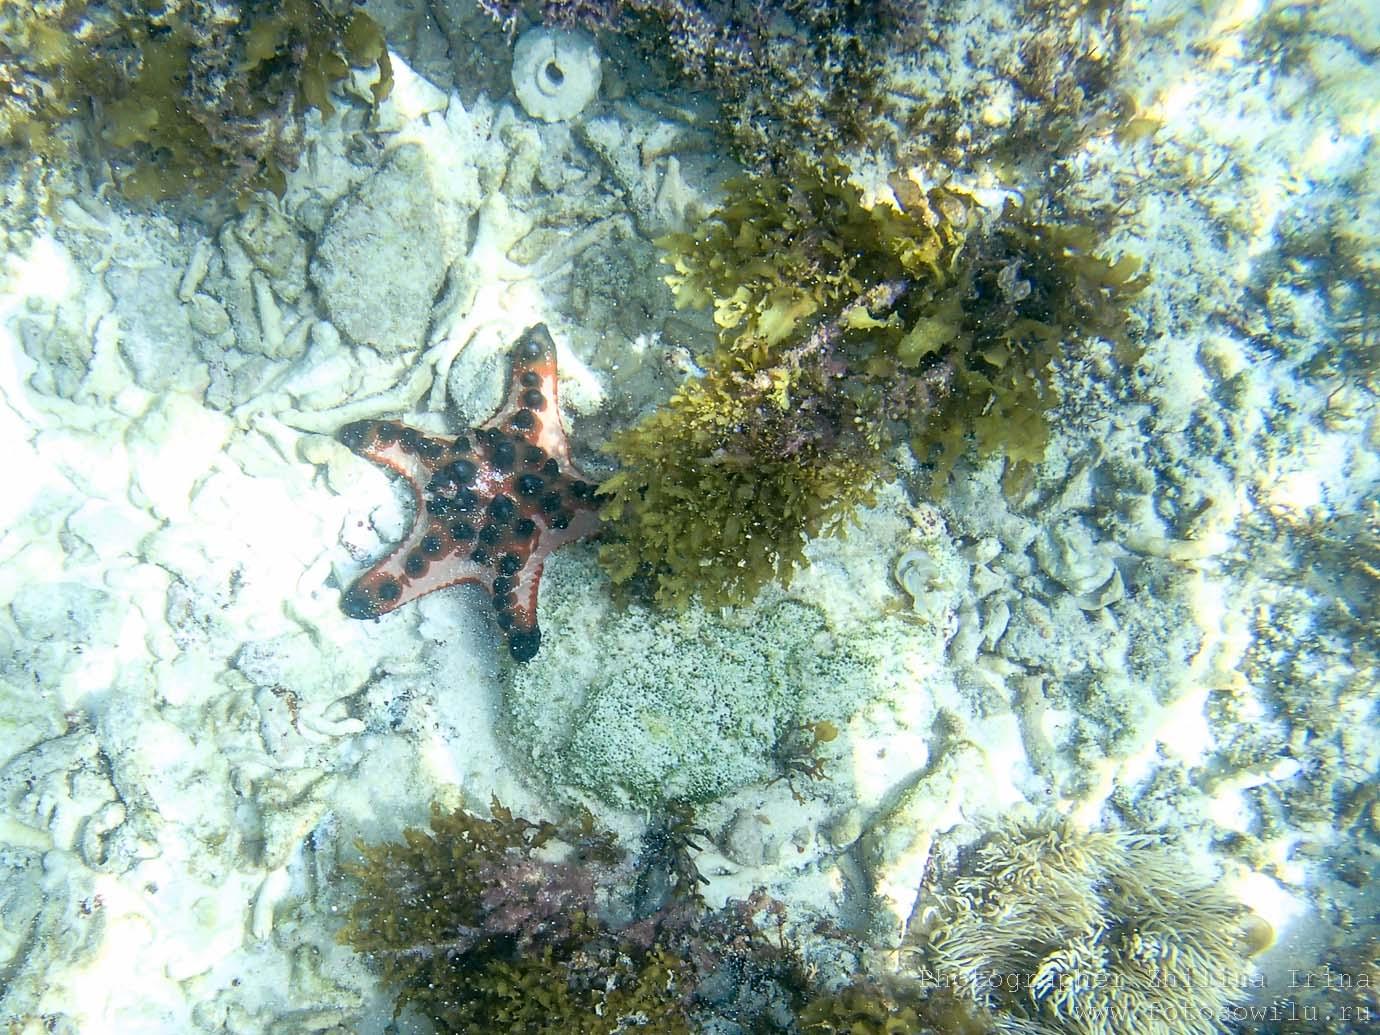 Алона Бич, Панглао, морские звезды, Филиппины, Alona beach